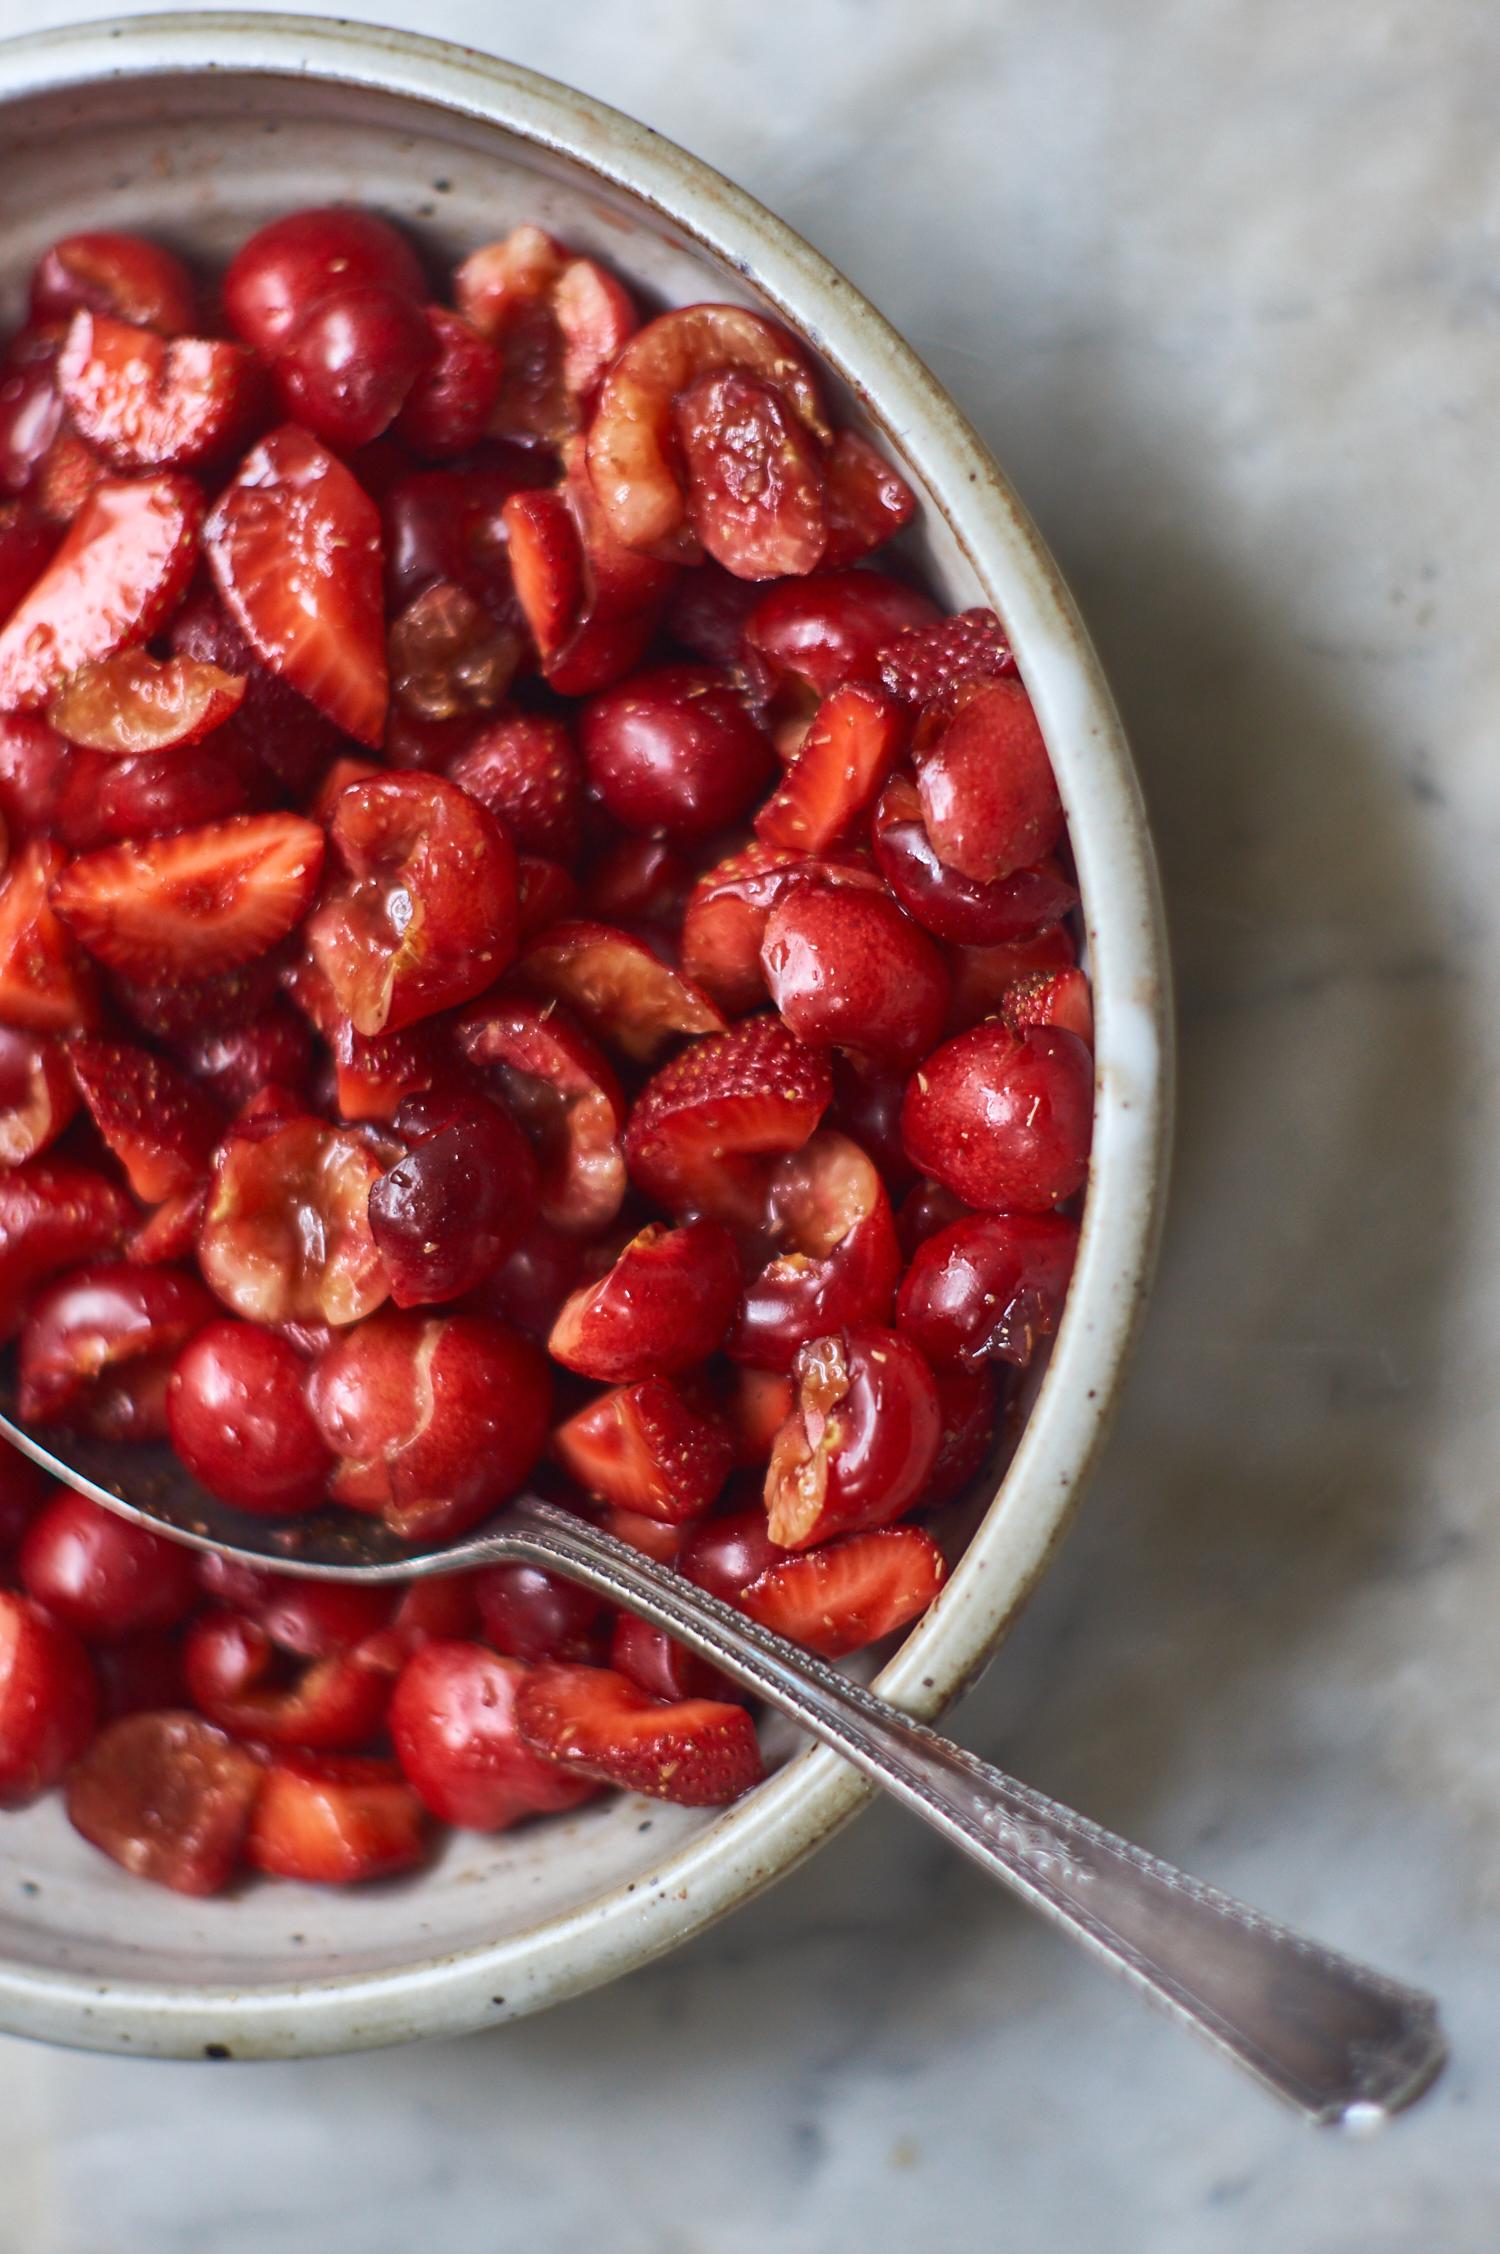 Simple Red Fruit Salad with Strawberries, Cherries, Lemon, and Brown Sugar